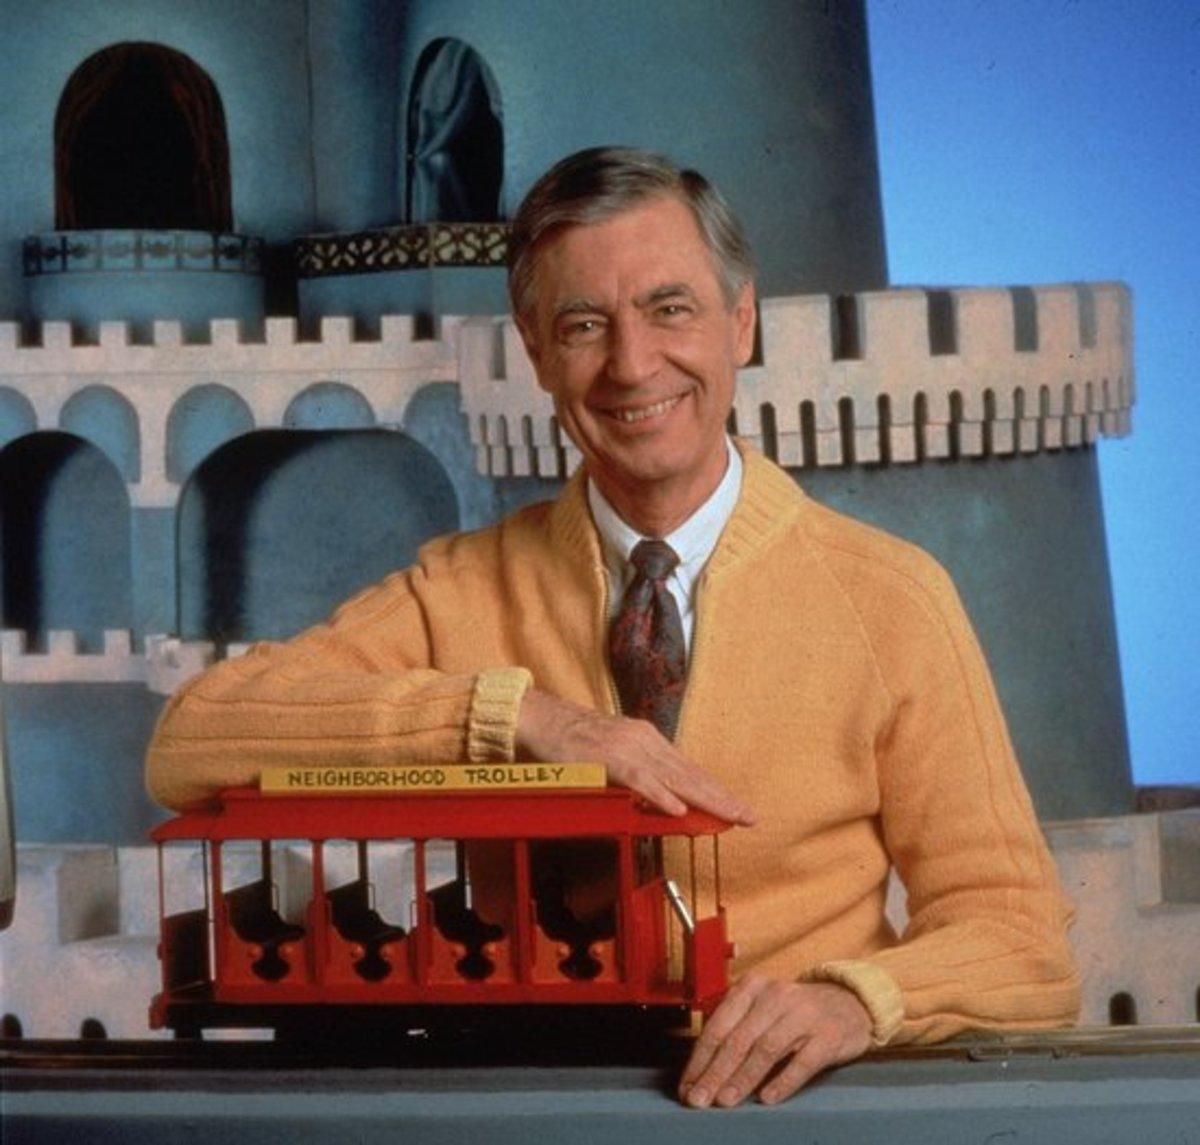 Fred Rogers: Creator of Mister Rogers' Neighborhood